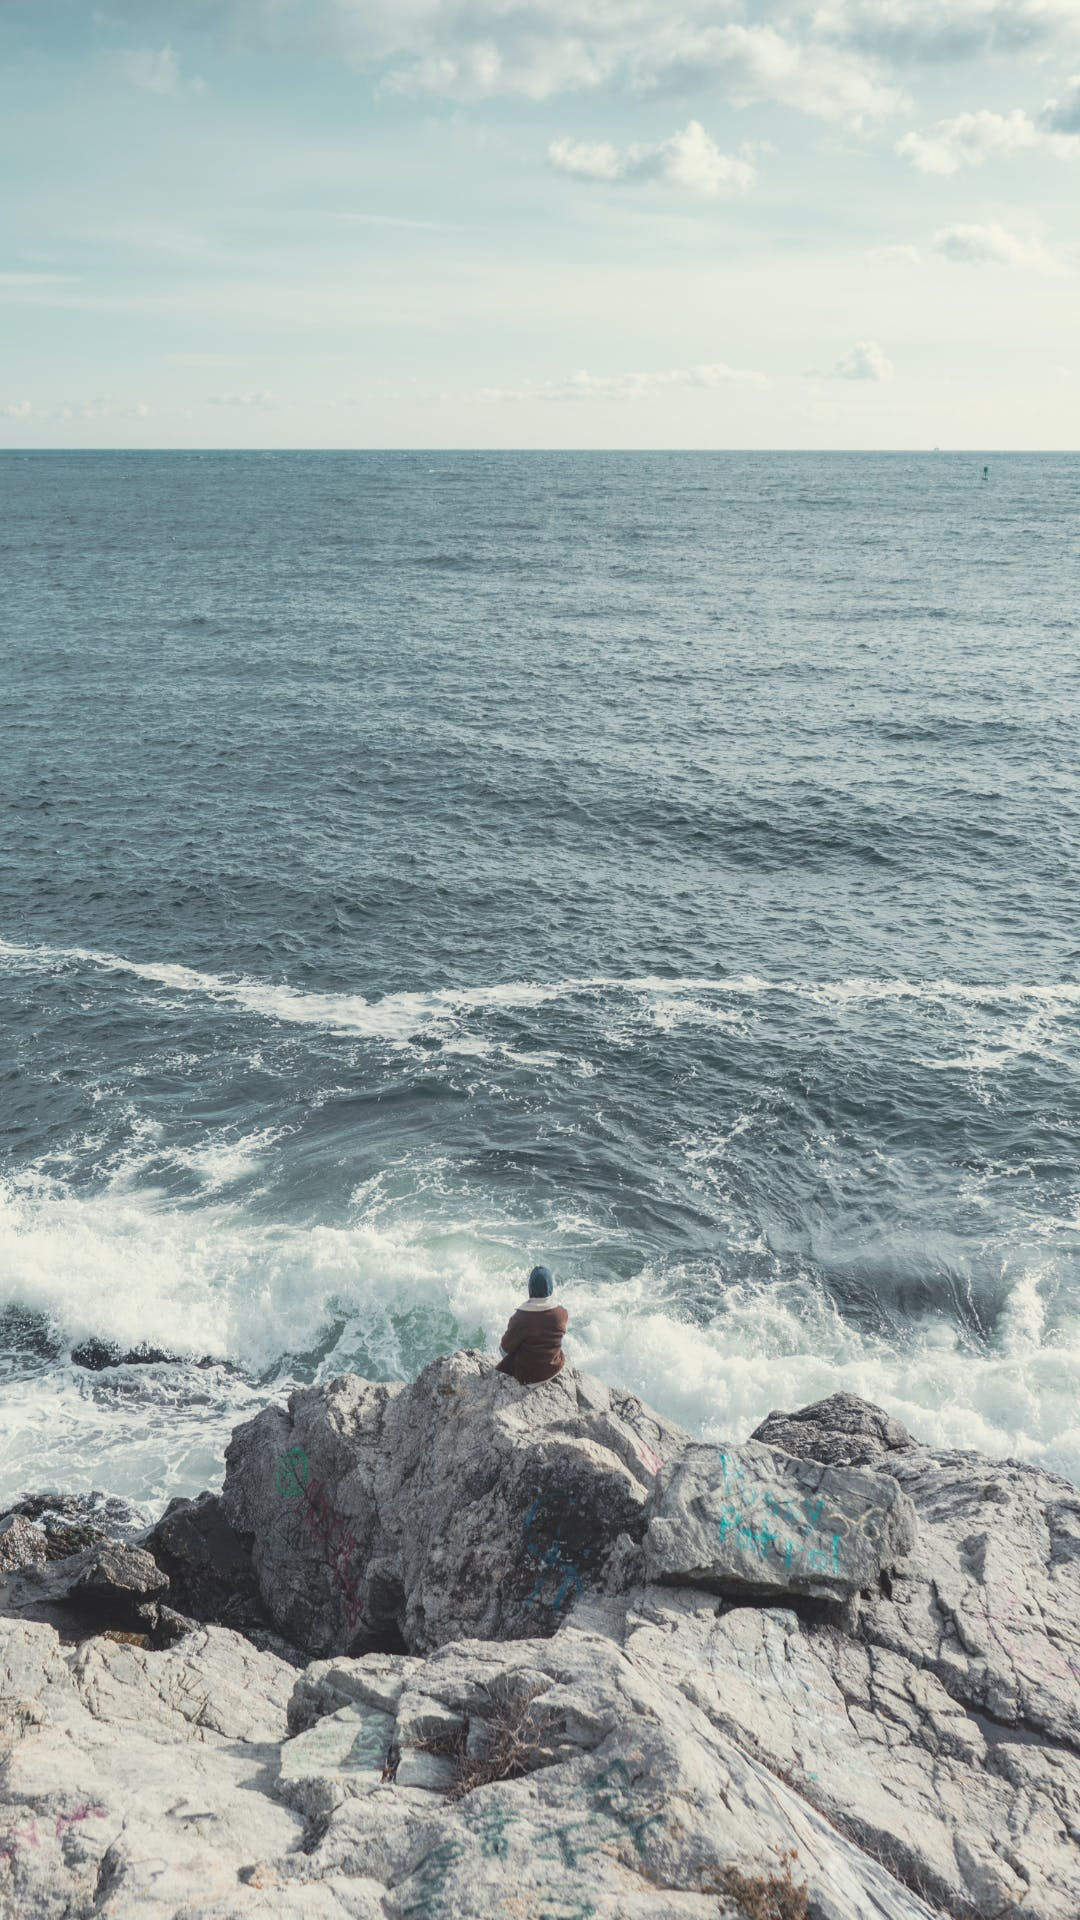 Person Sitting on Gray Rock Near Sea